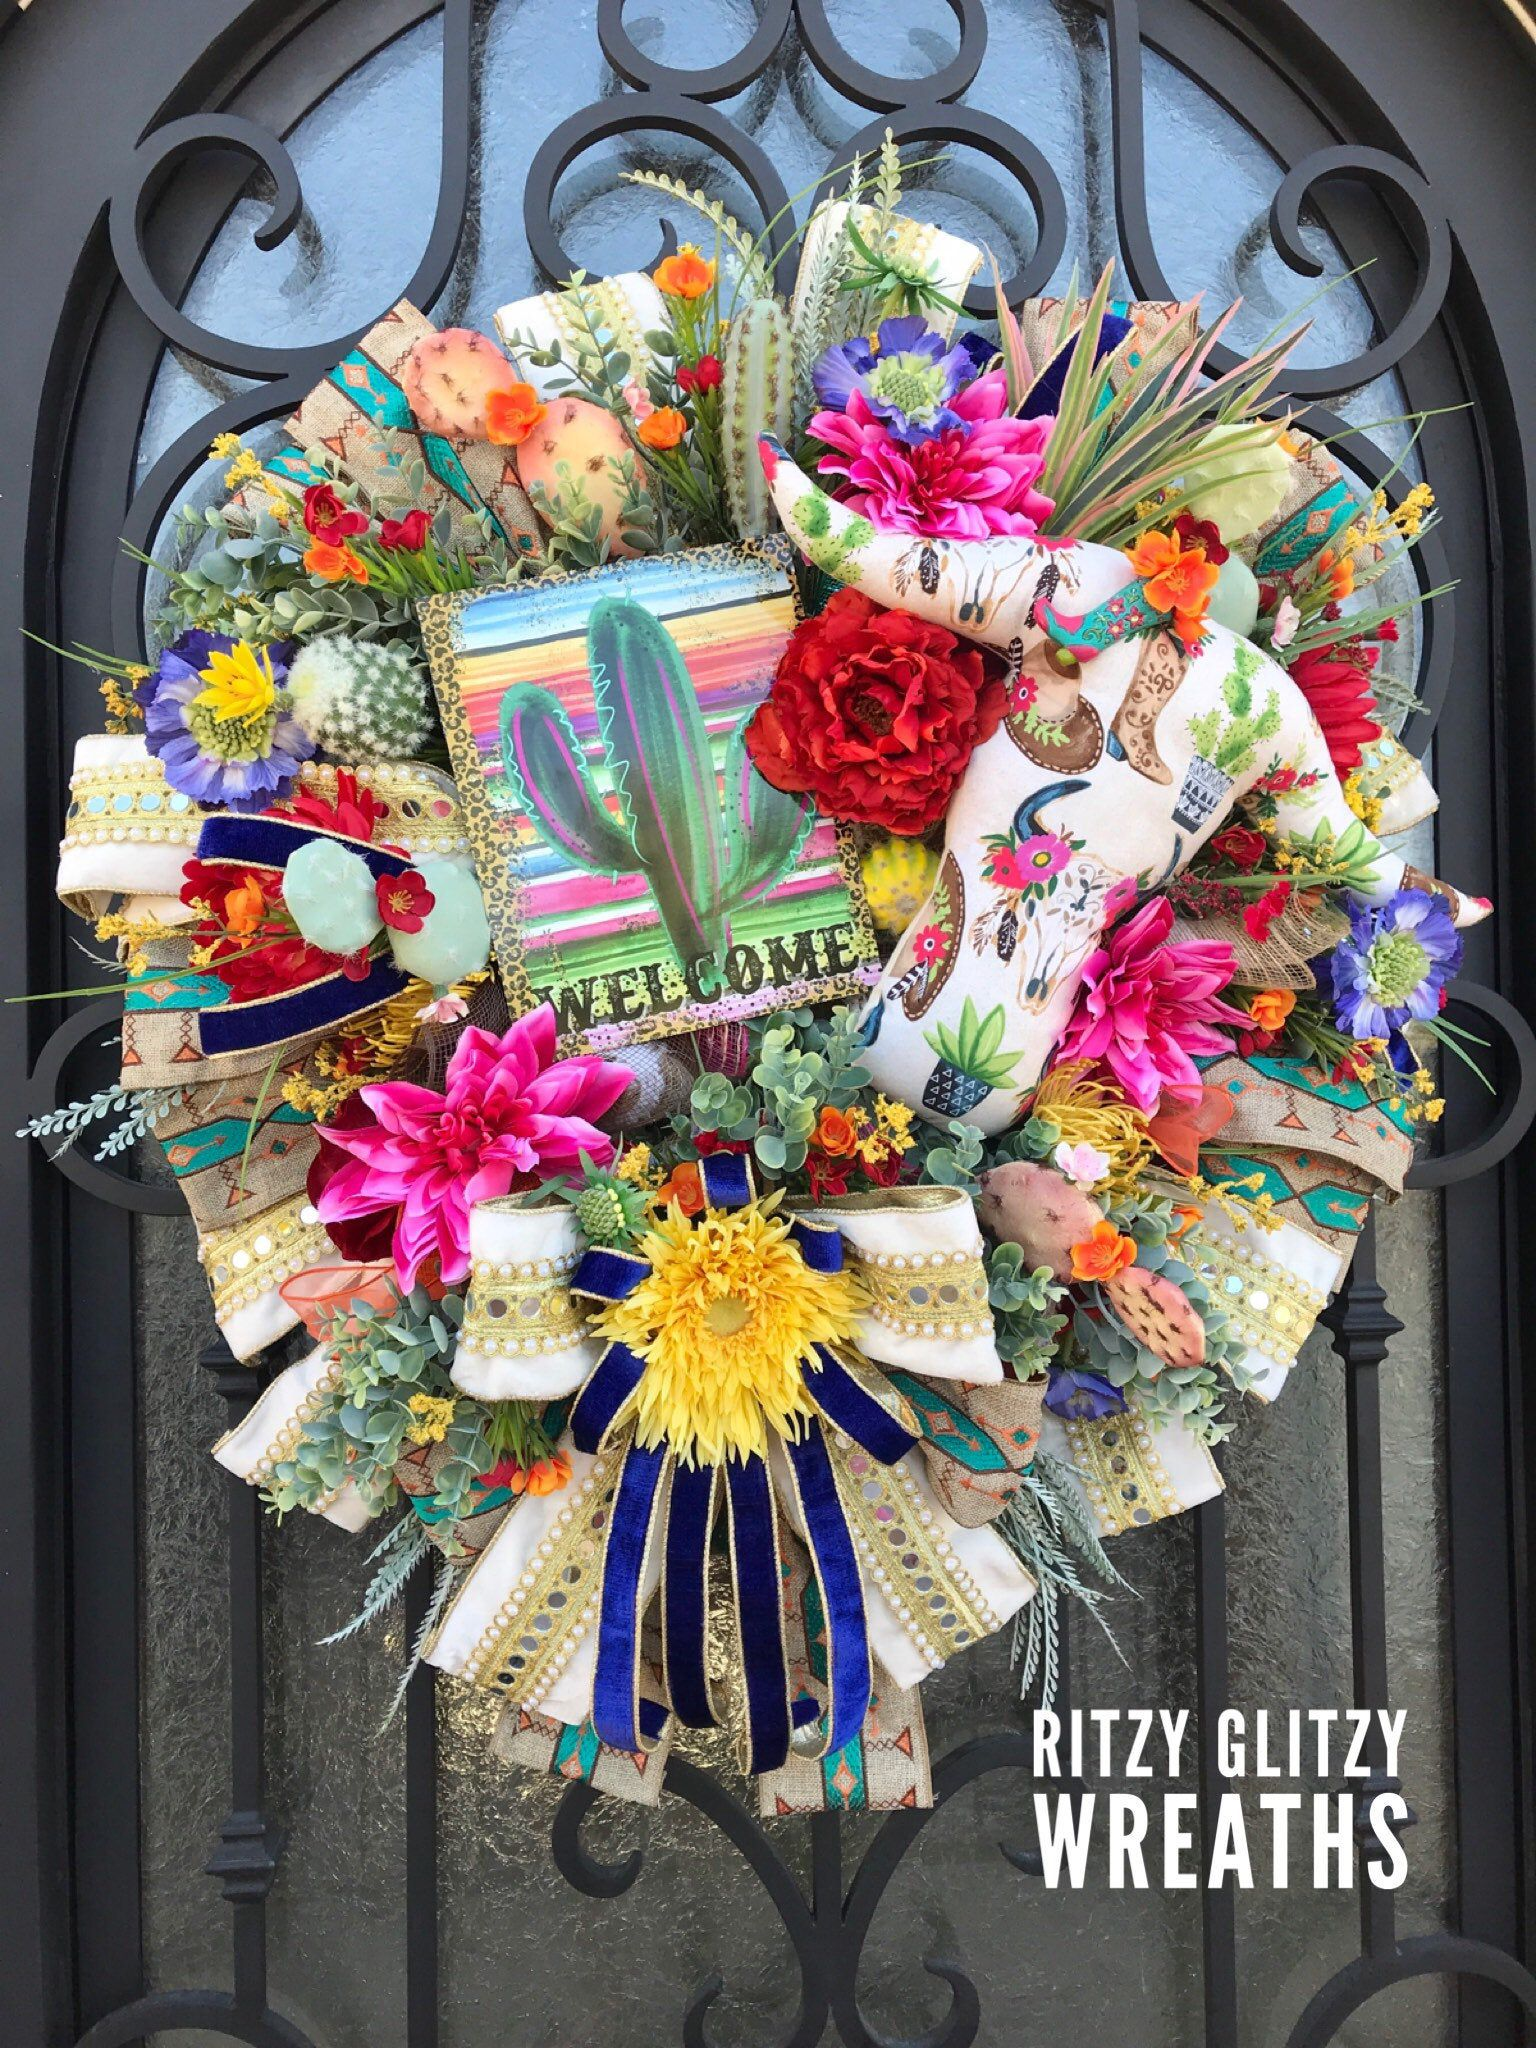 Photo of Southwest Wreath, Summer Wreath, Succulent Wreath, XL Luxury Wreath, Front Door Wreath, Southwest Decor, Wreaths, Summer Decor